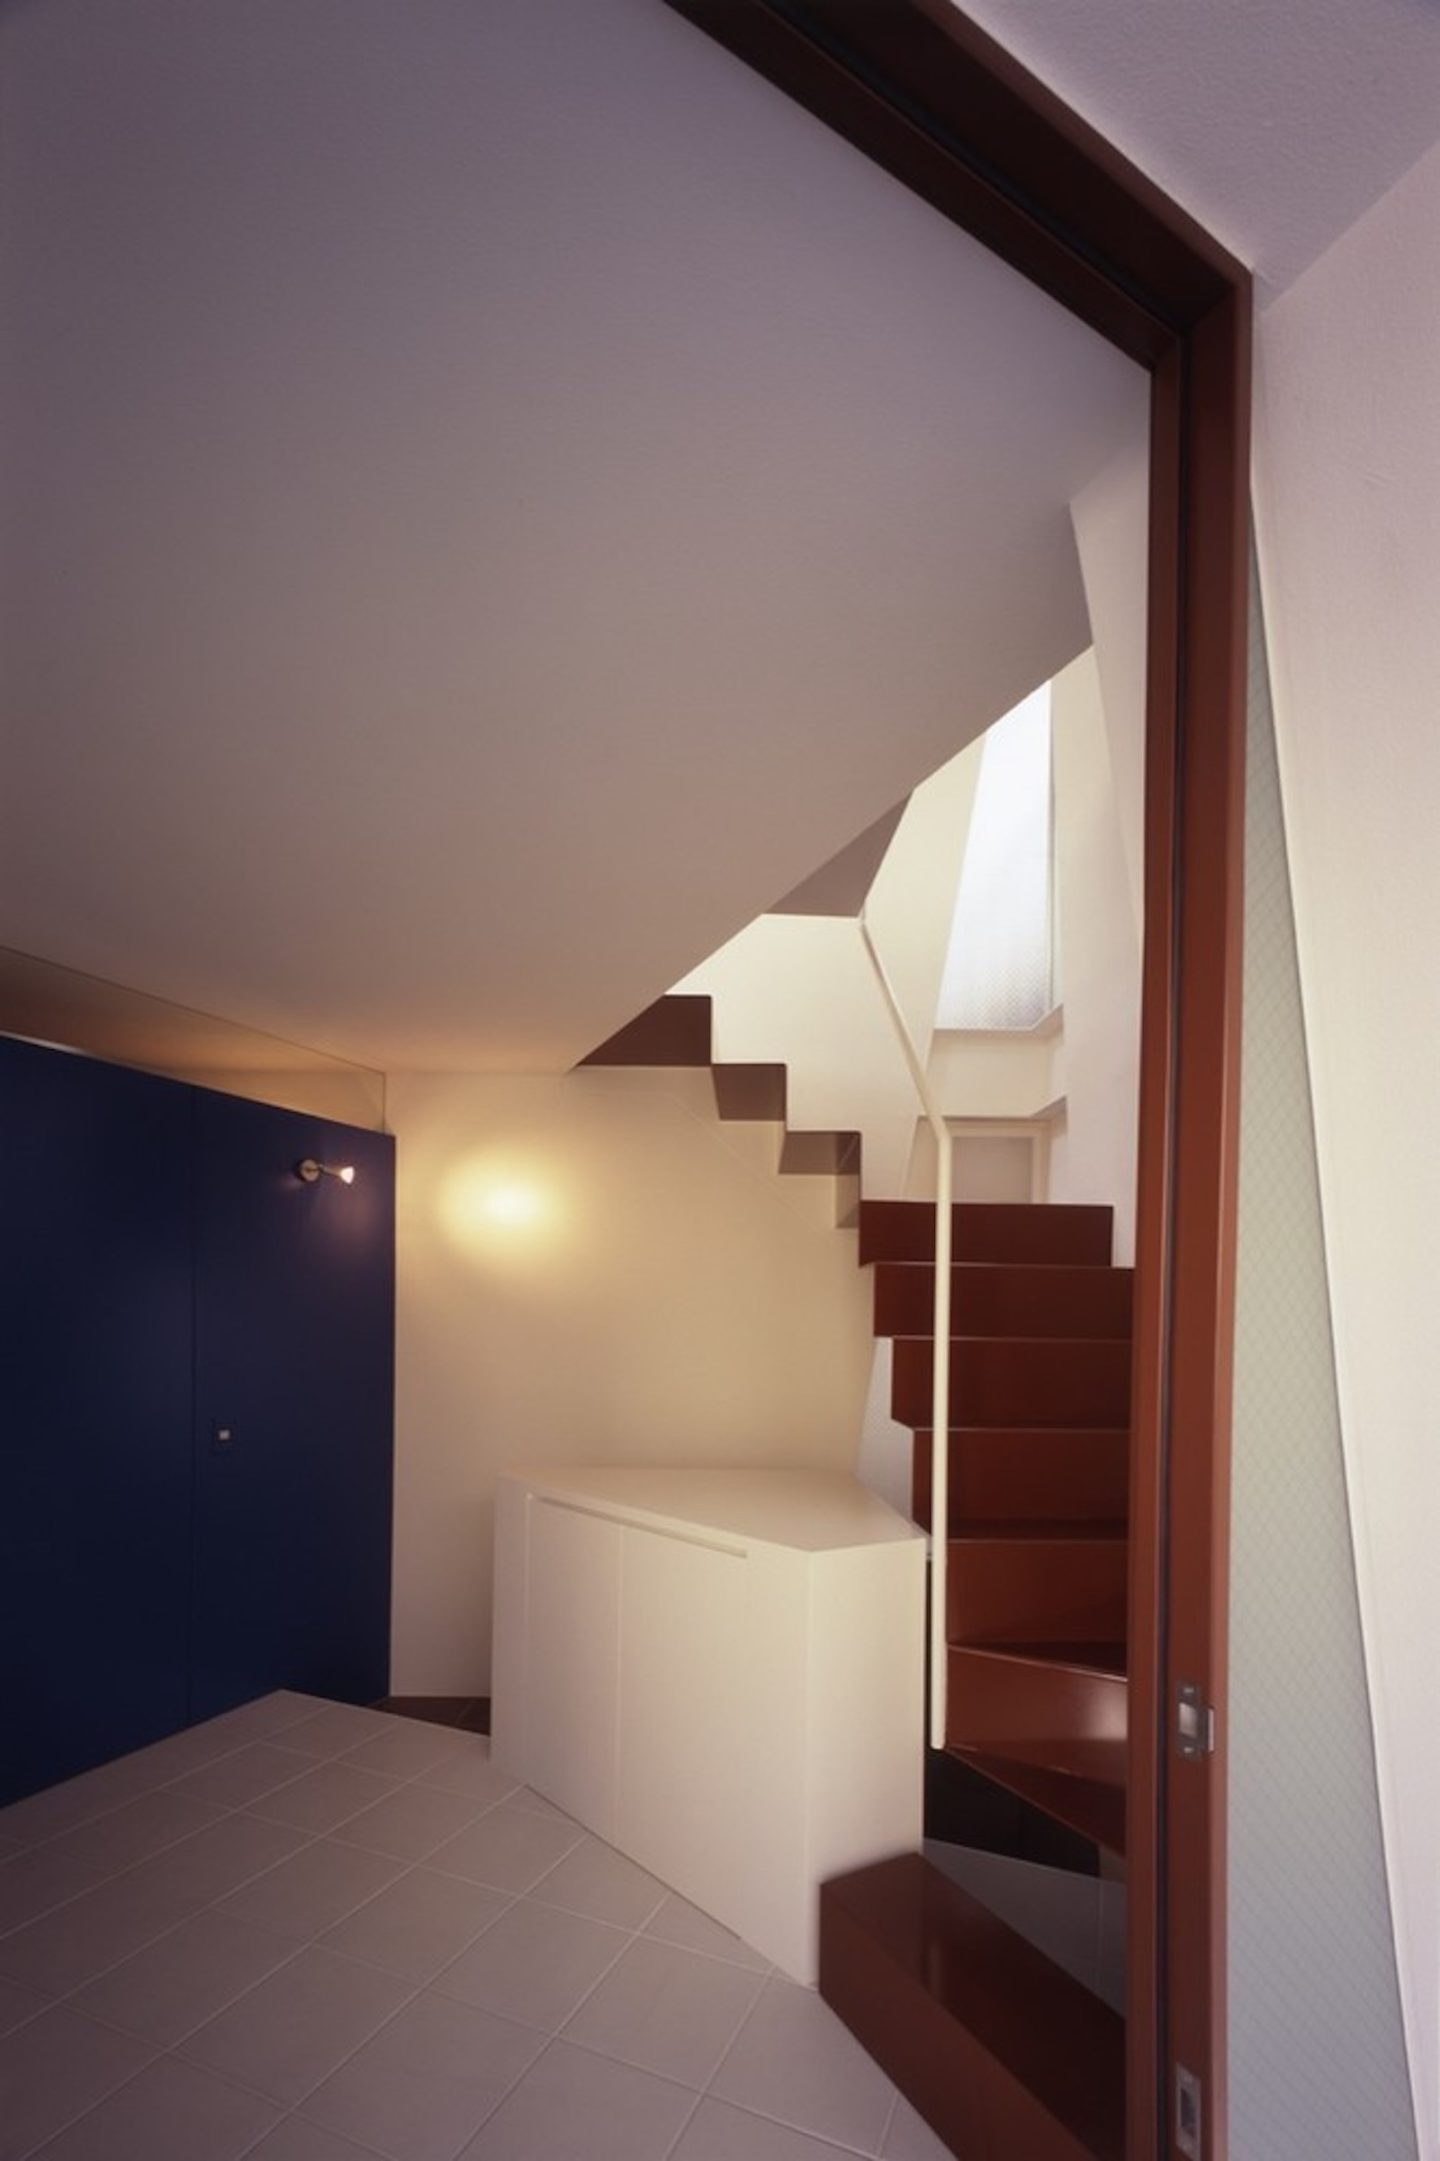 IGNANT-Architecture-Atelier-Tekuto-Reflection-Of-Mineral-007